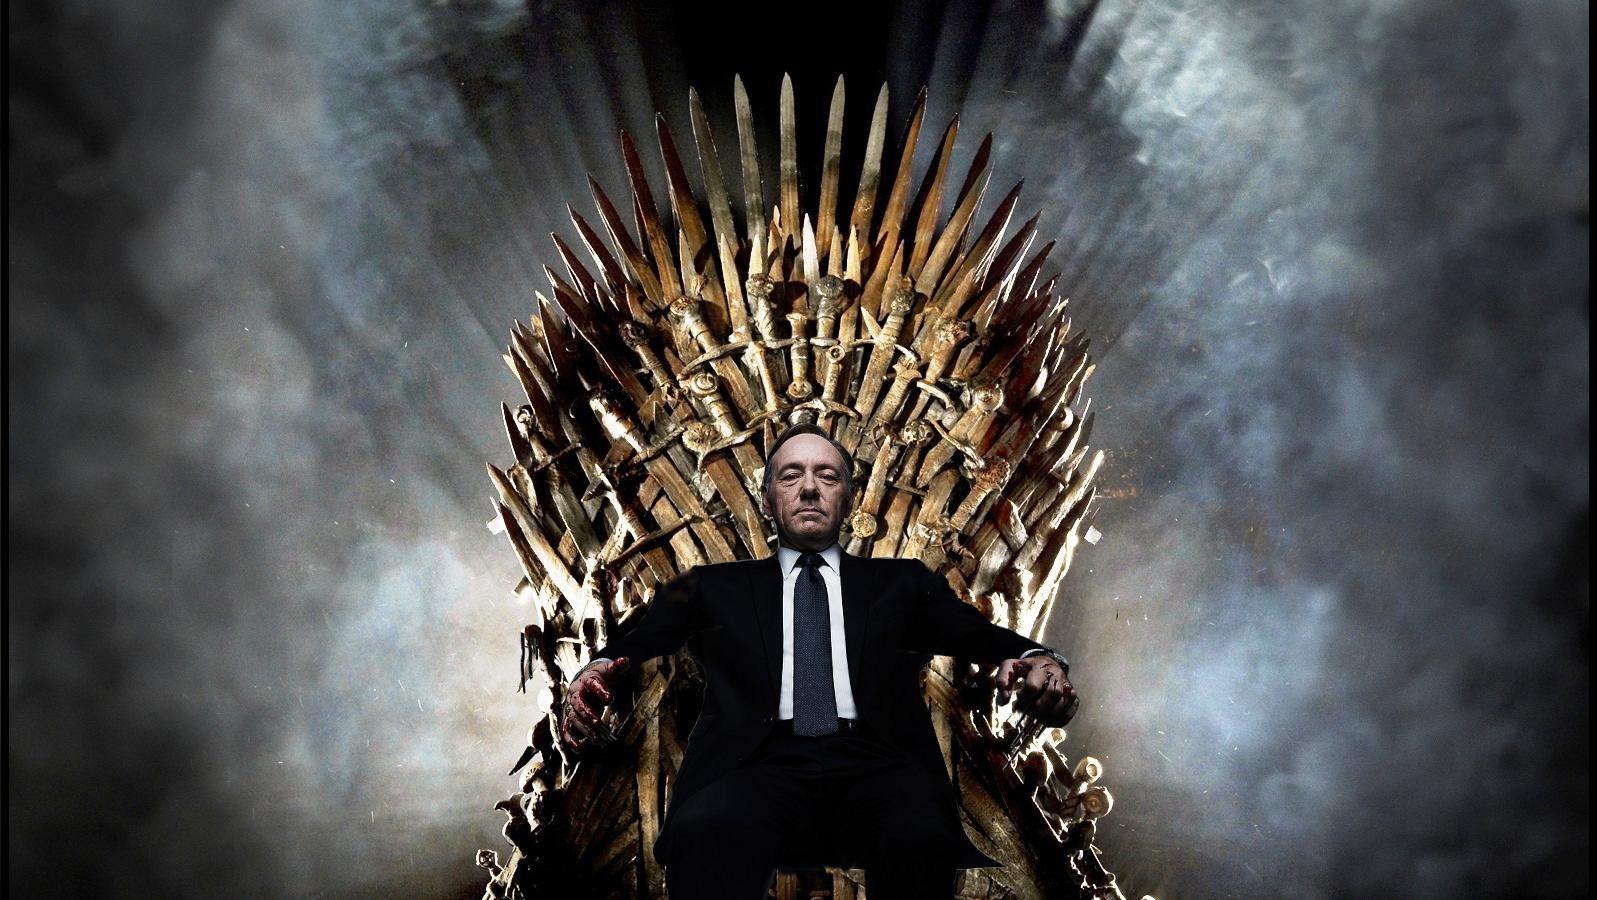 Картинка железный трон из игры престолов